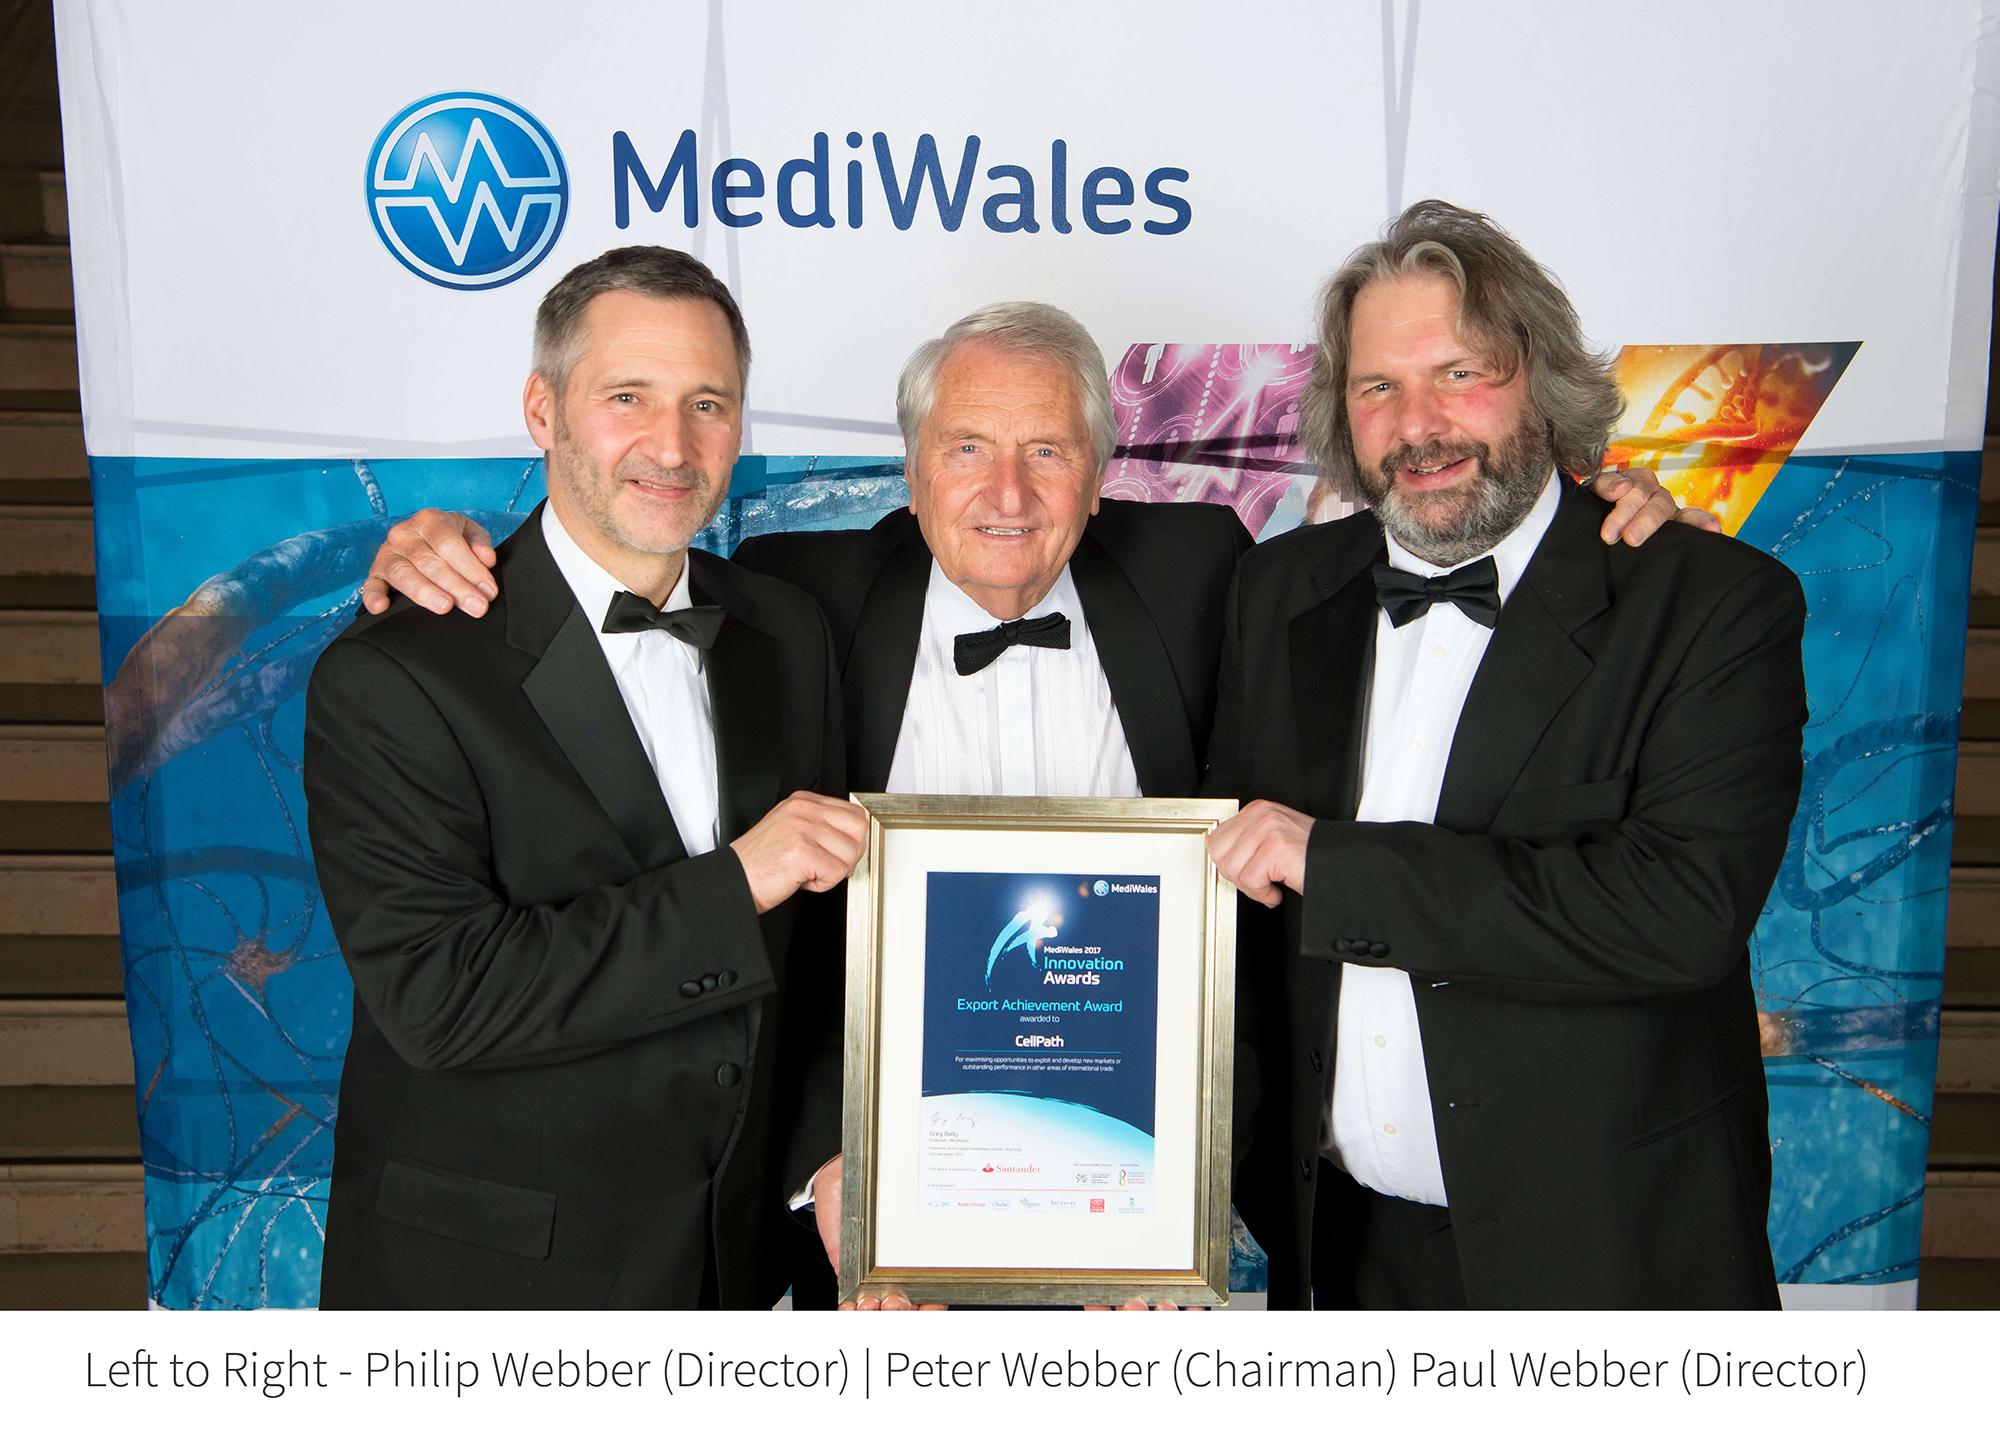 mediwales-innovations-winners-webbers